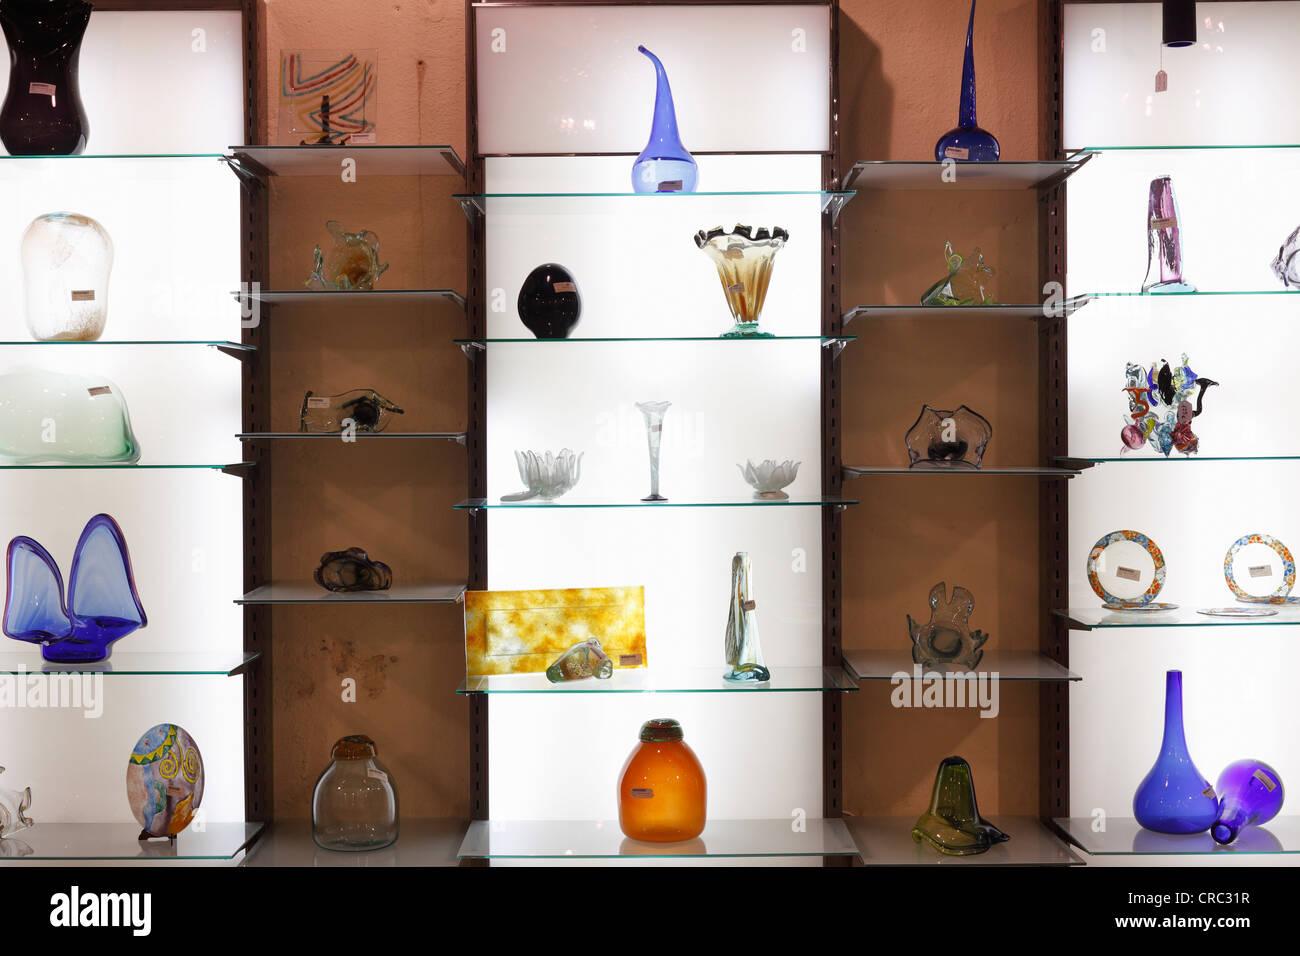 Showroom of Menestralia blown glass in Campanet, Majorca, Balearic Islands, Spain, Europe - Stock Image